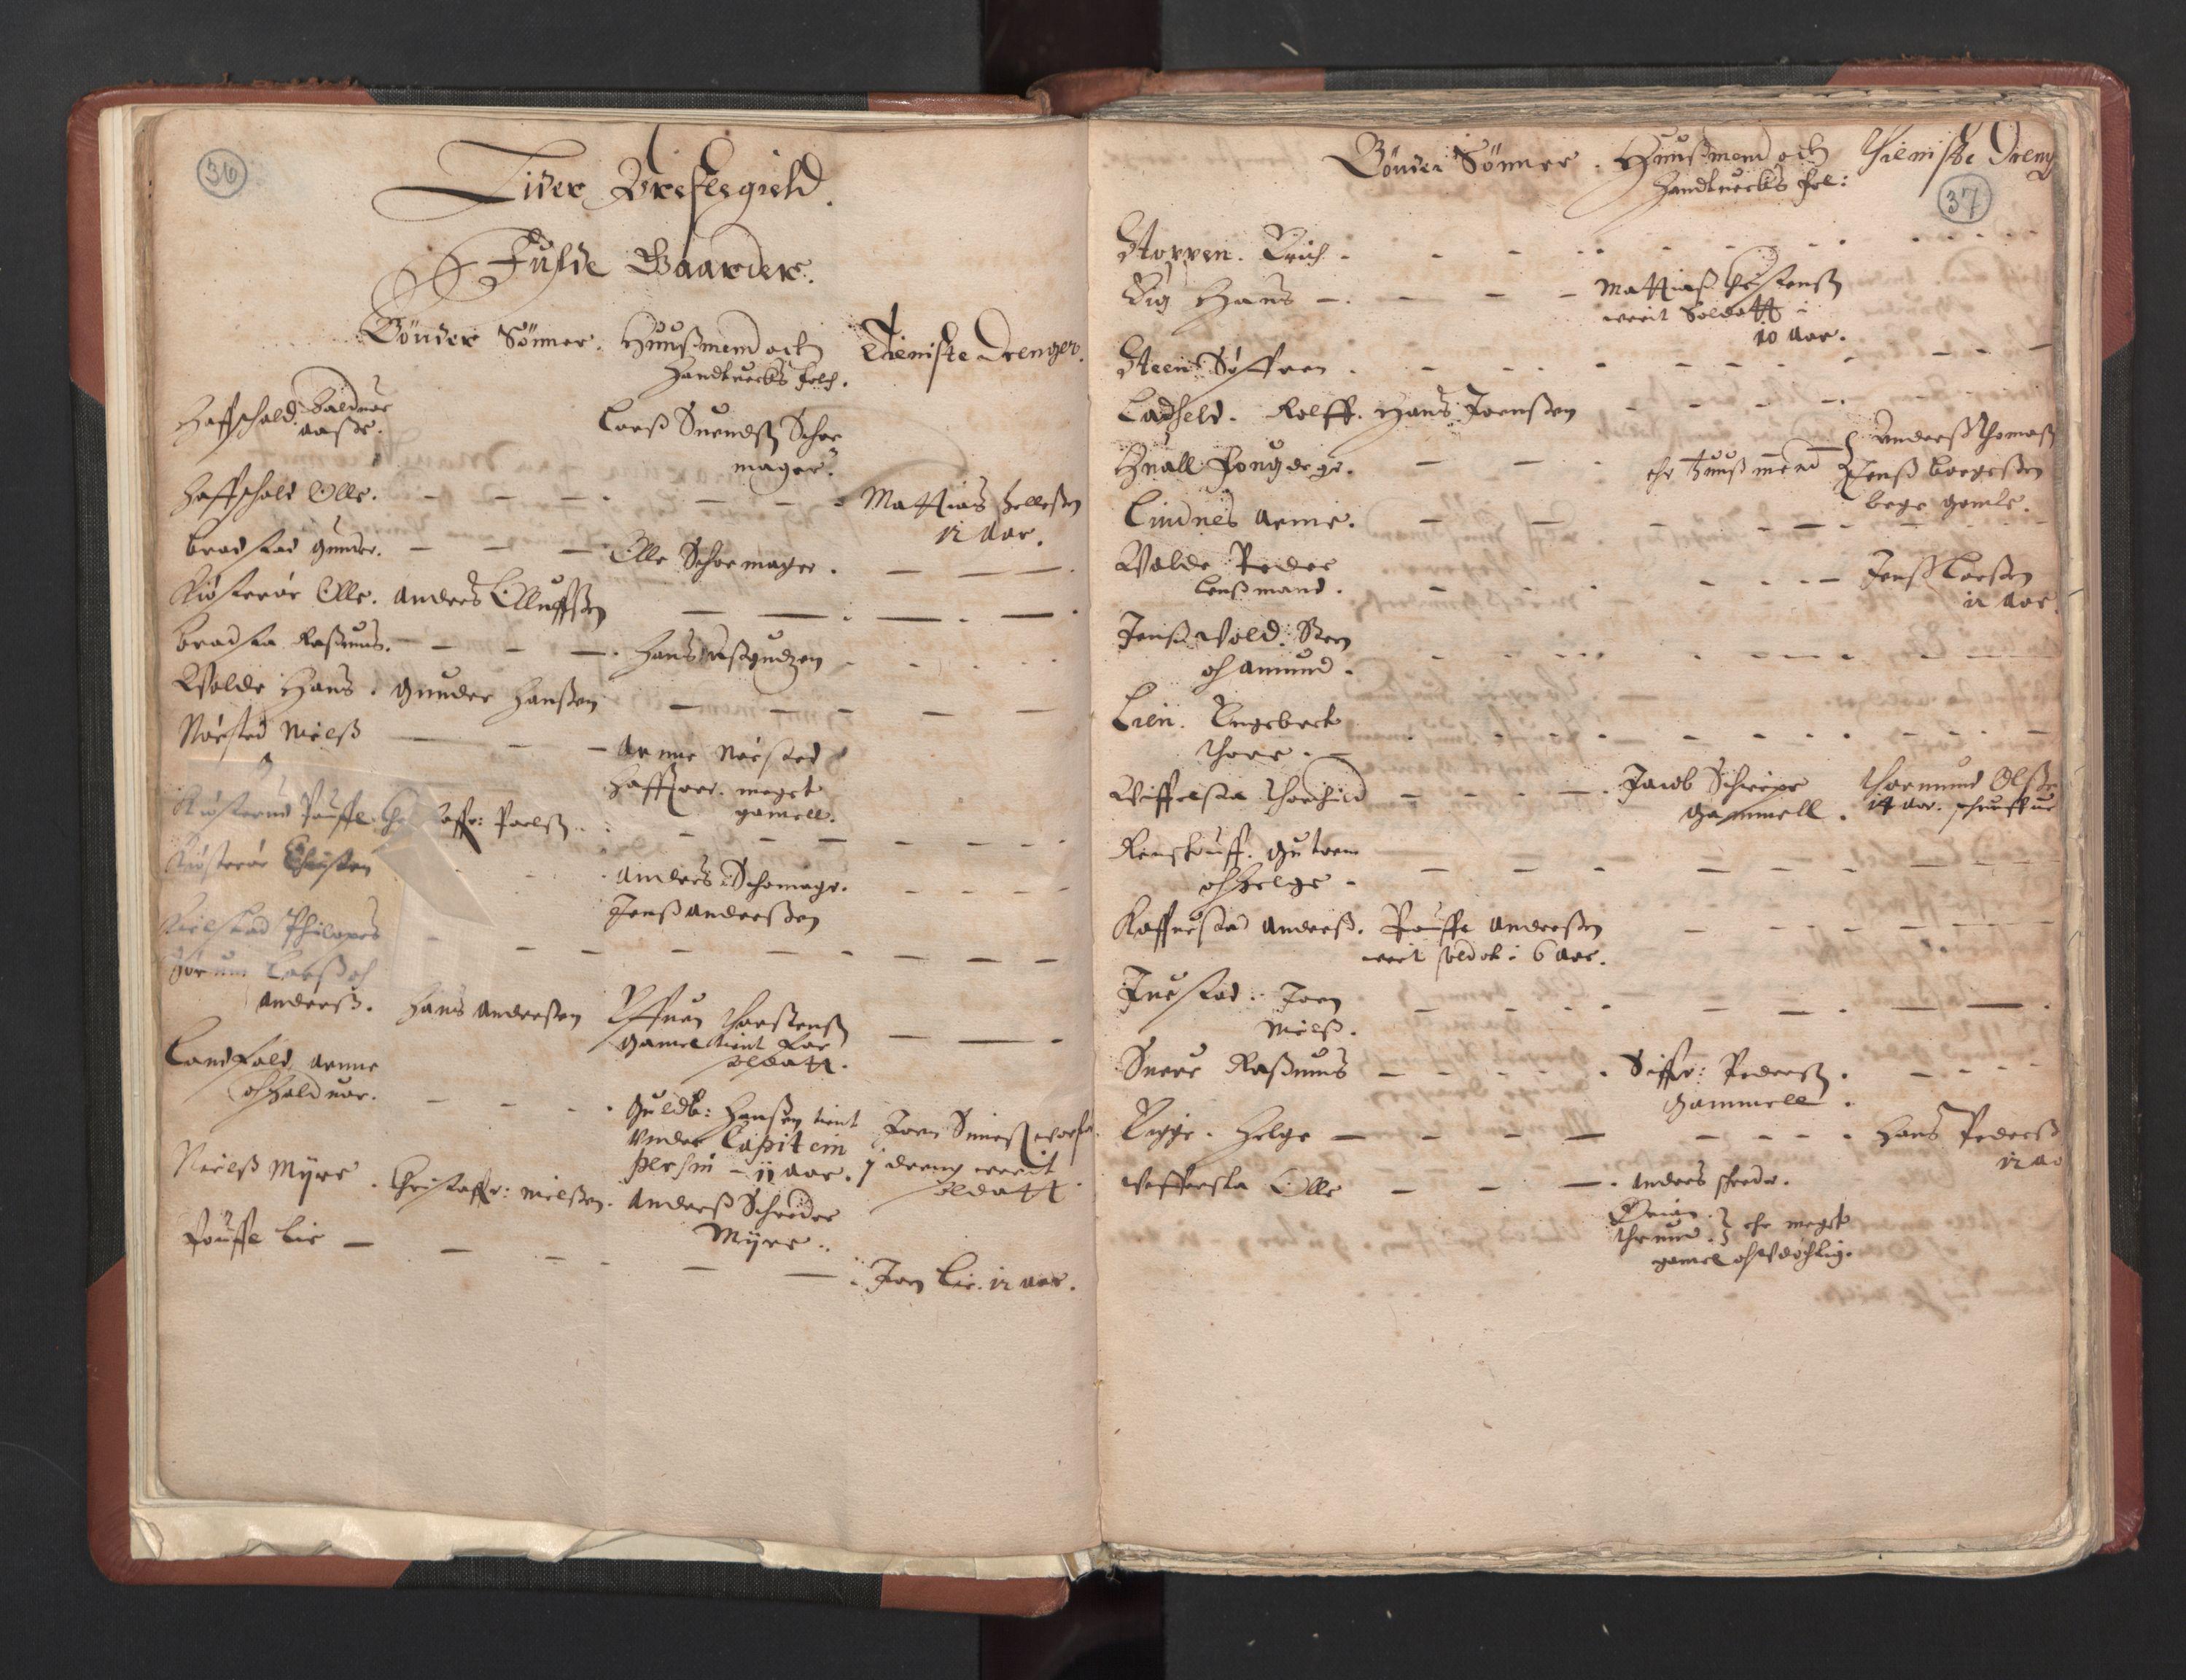 RA, Fogdenes og sorenskrivernes manntall 1664-1666, nr. 5: Fogderier (len og skipreider) i nåværende Buskerud fylke og Vestfold fylke, 1664, s. 36-37